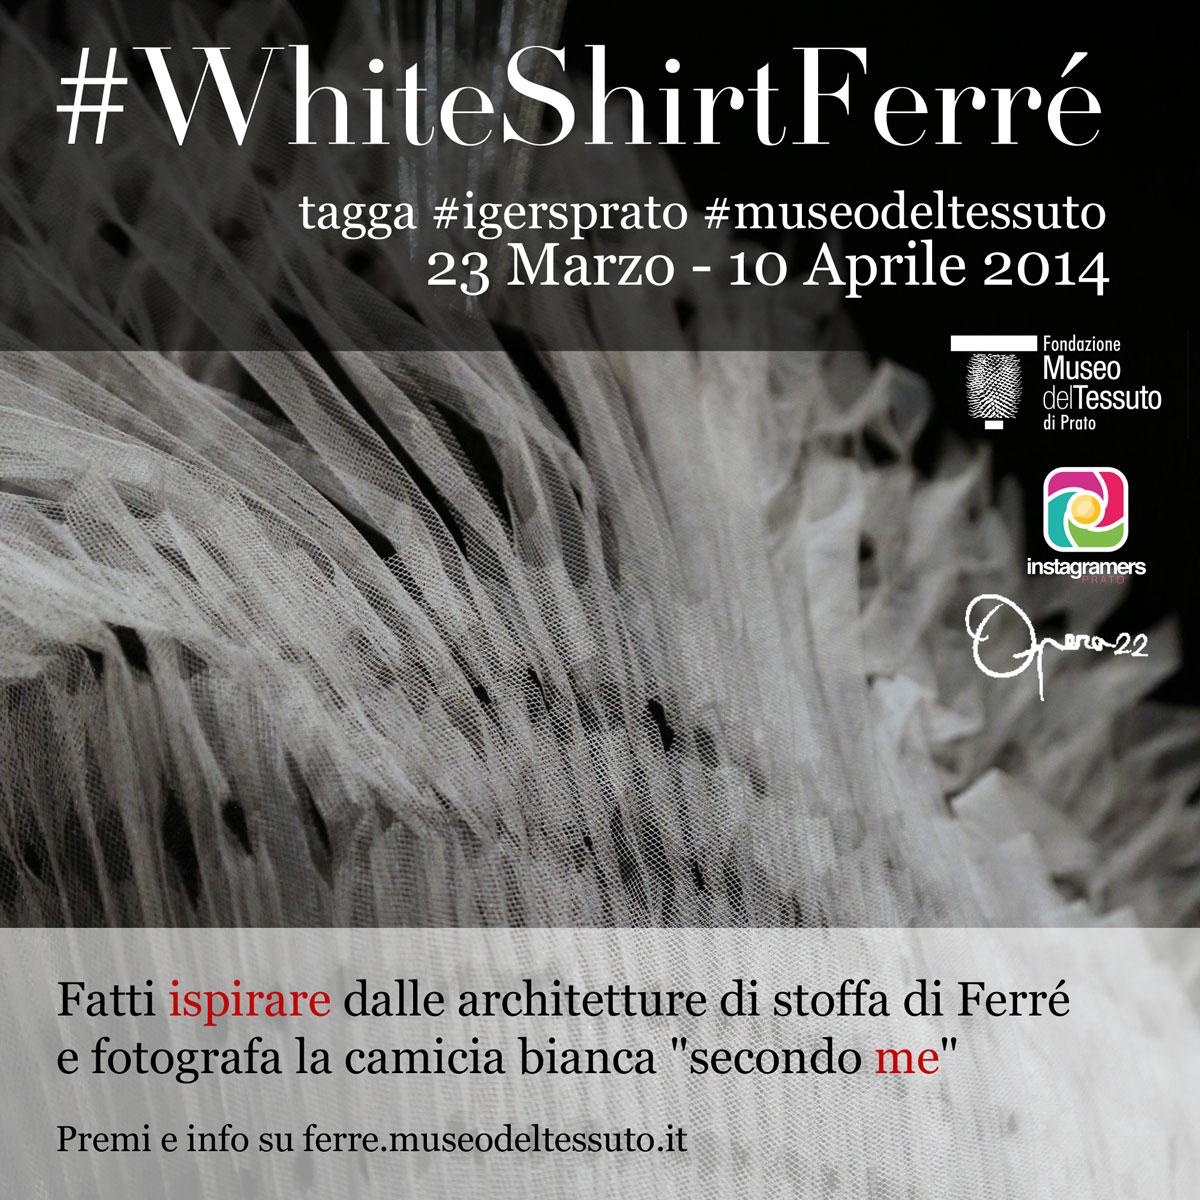 La camicia bianca secondo Gianfranco Ferré e IgersPrato